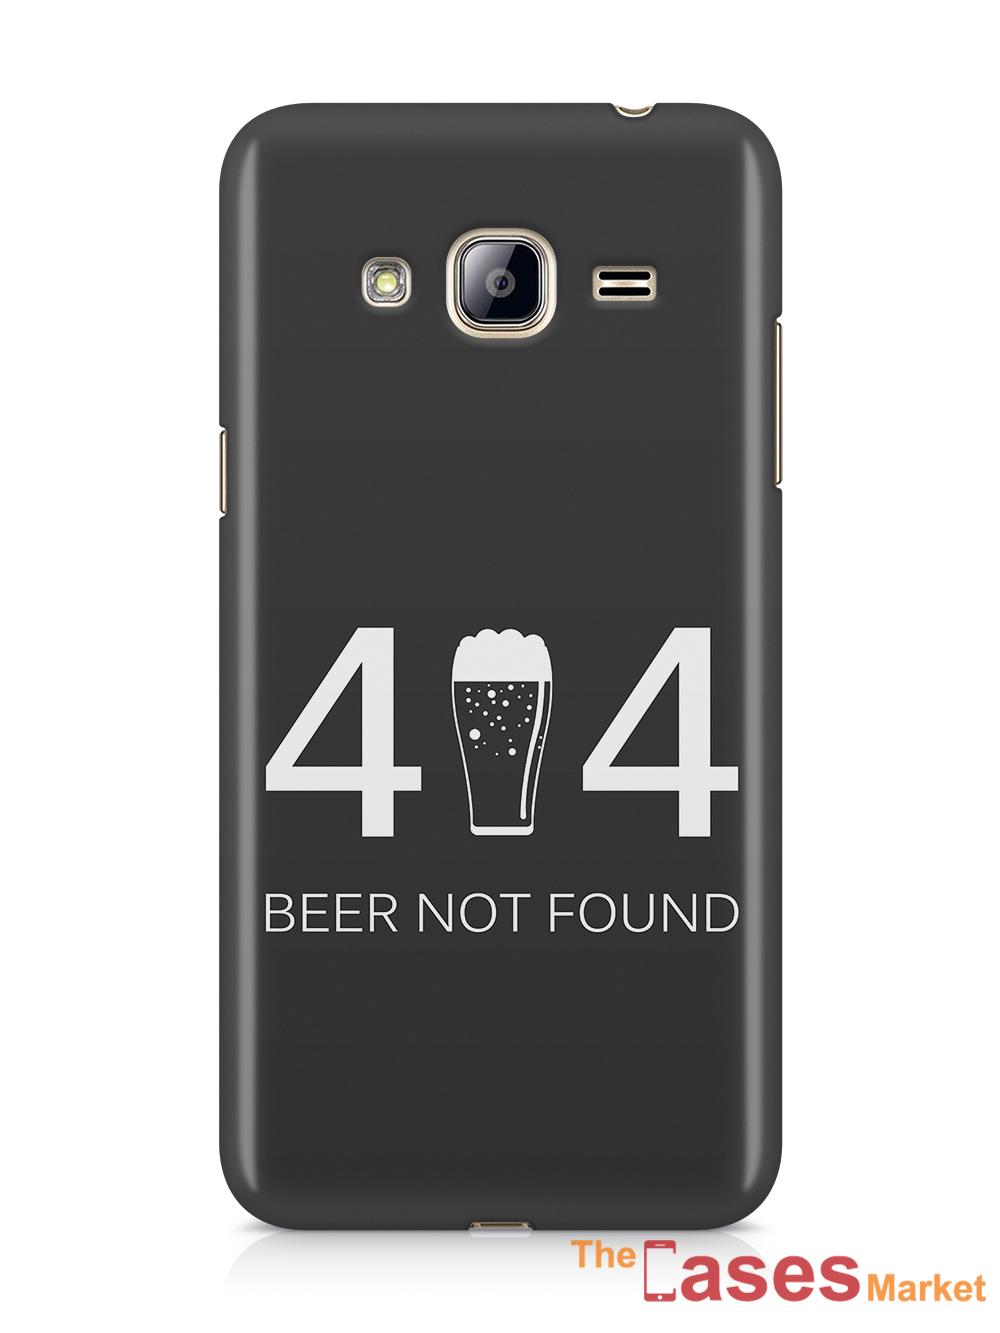 capa telemoveis samsung 404 beer not found